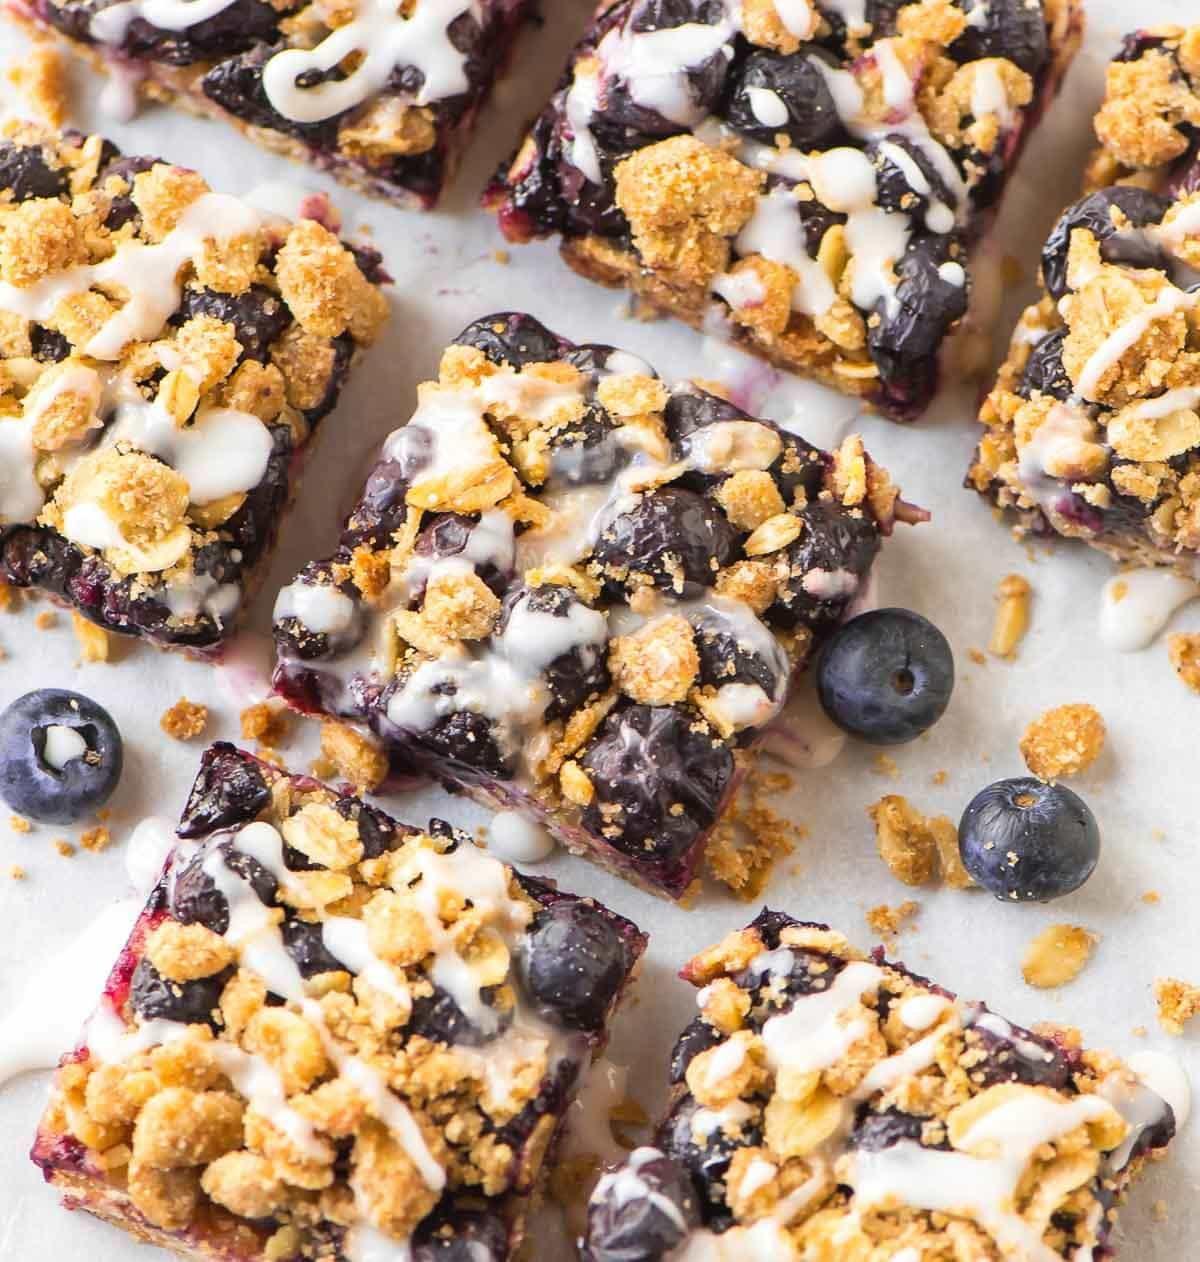 Healthy Blueberry Dessert Recipes  Blueberry Oatmeal Bars